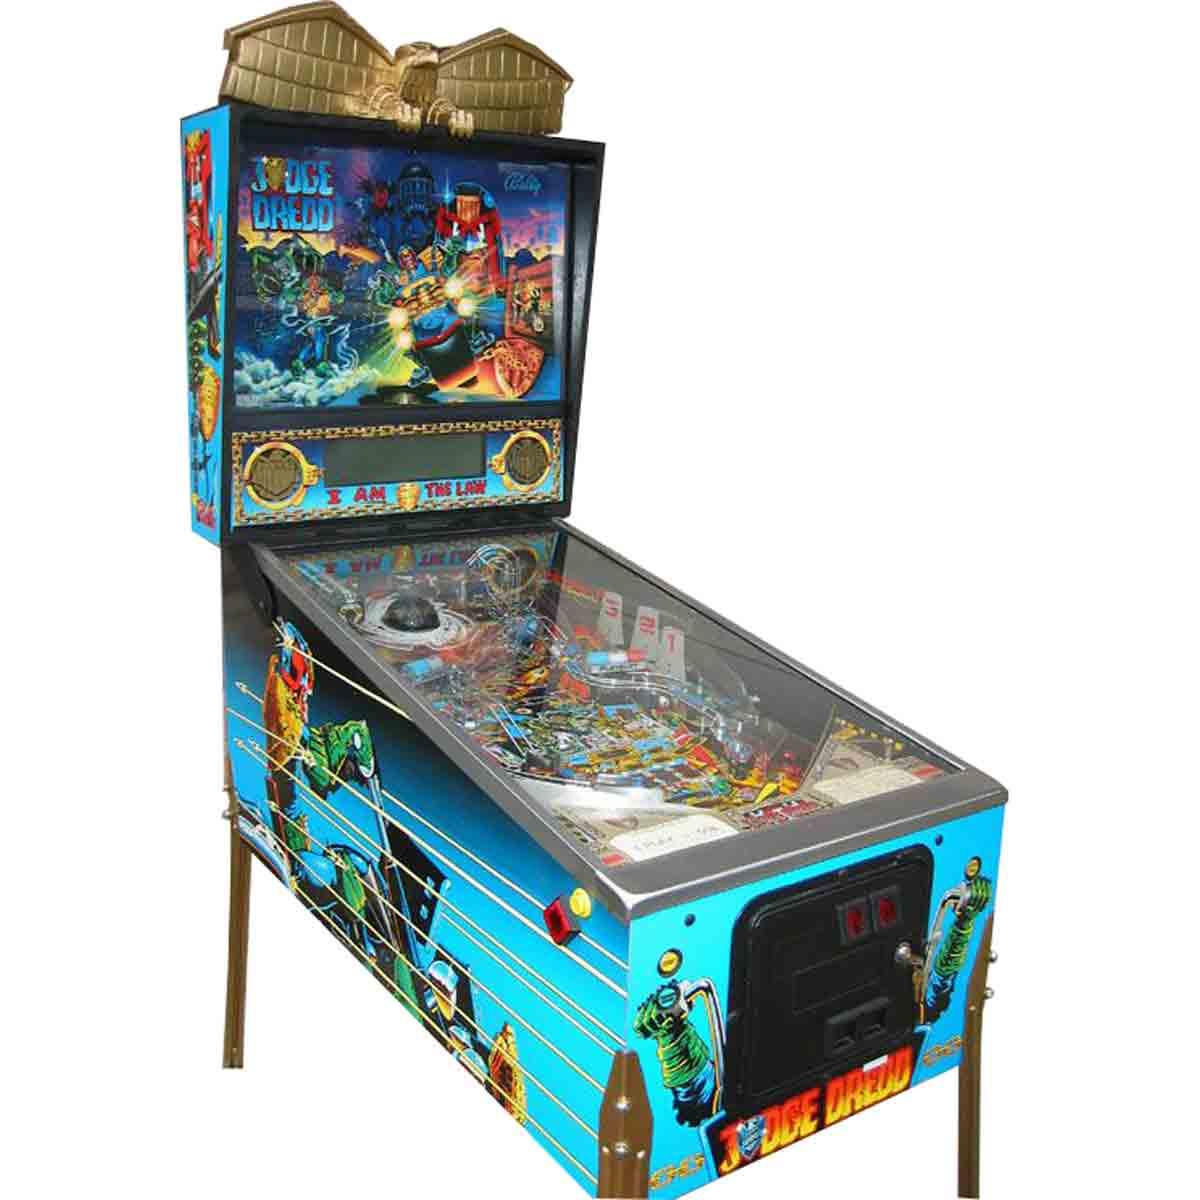 Buy Judge Dredd Pinball Machine by Williams Online at $4999